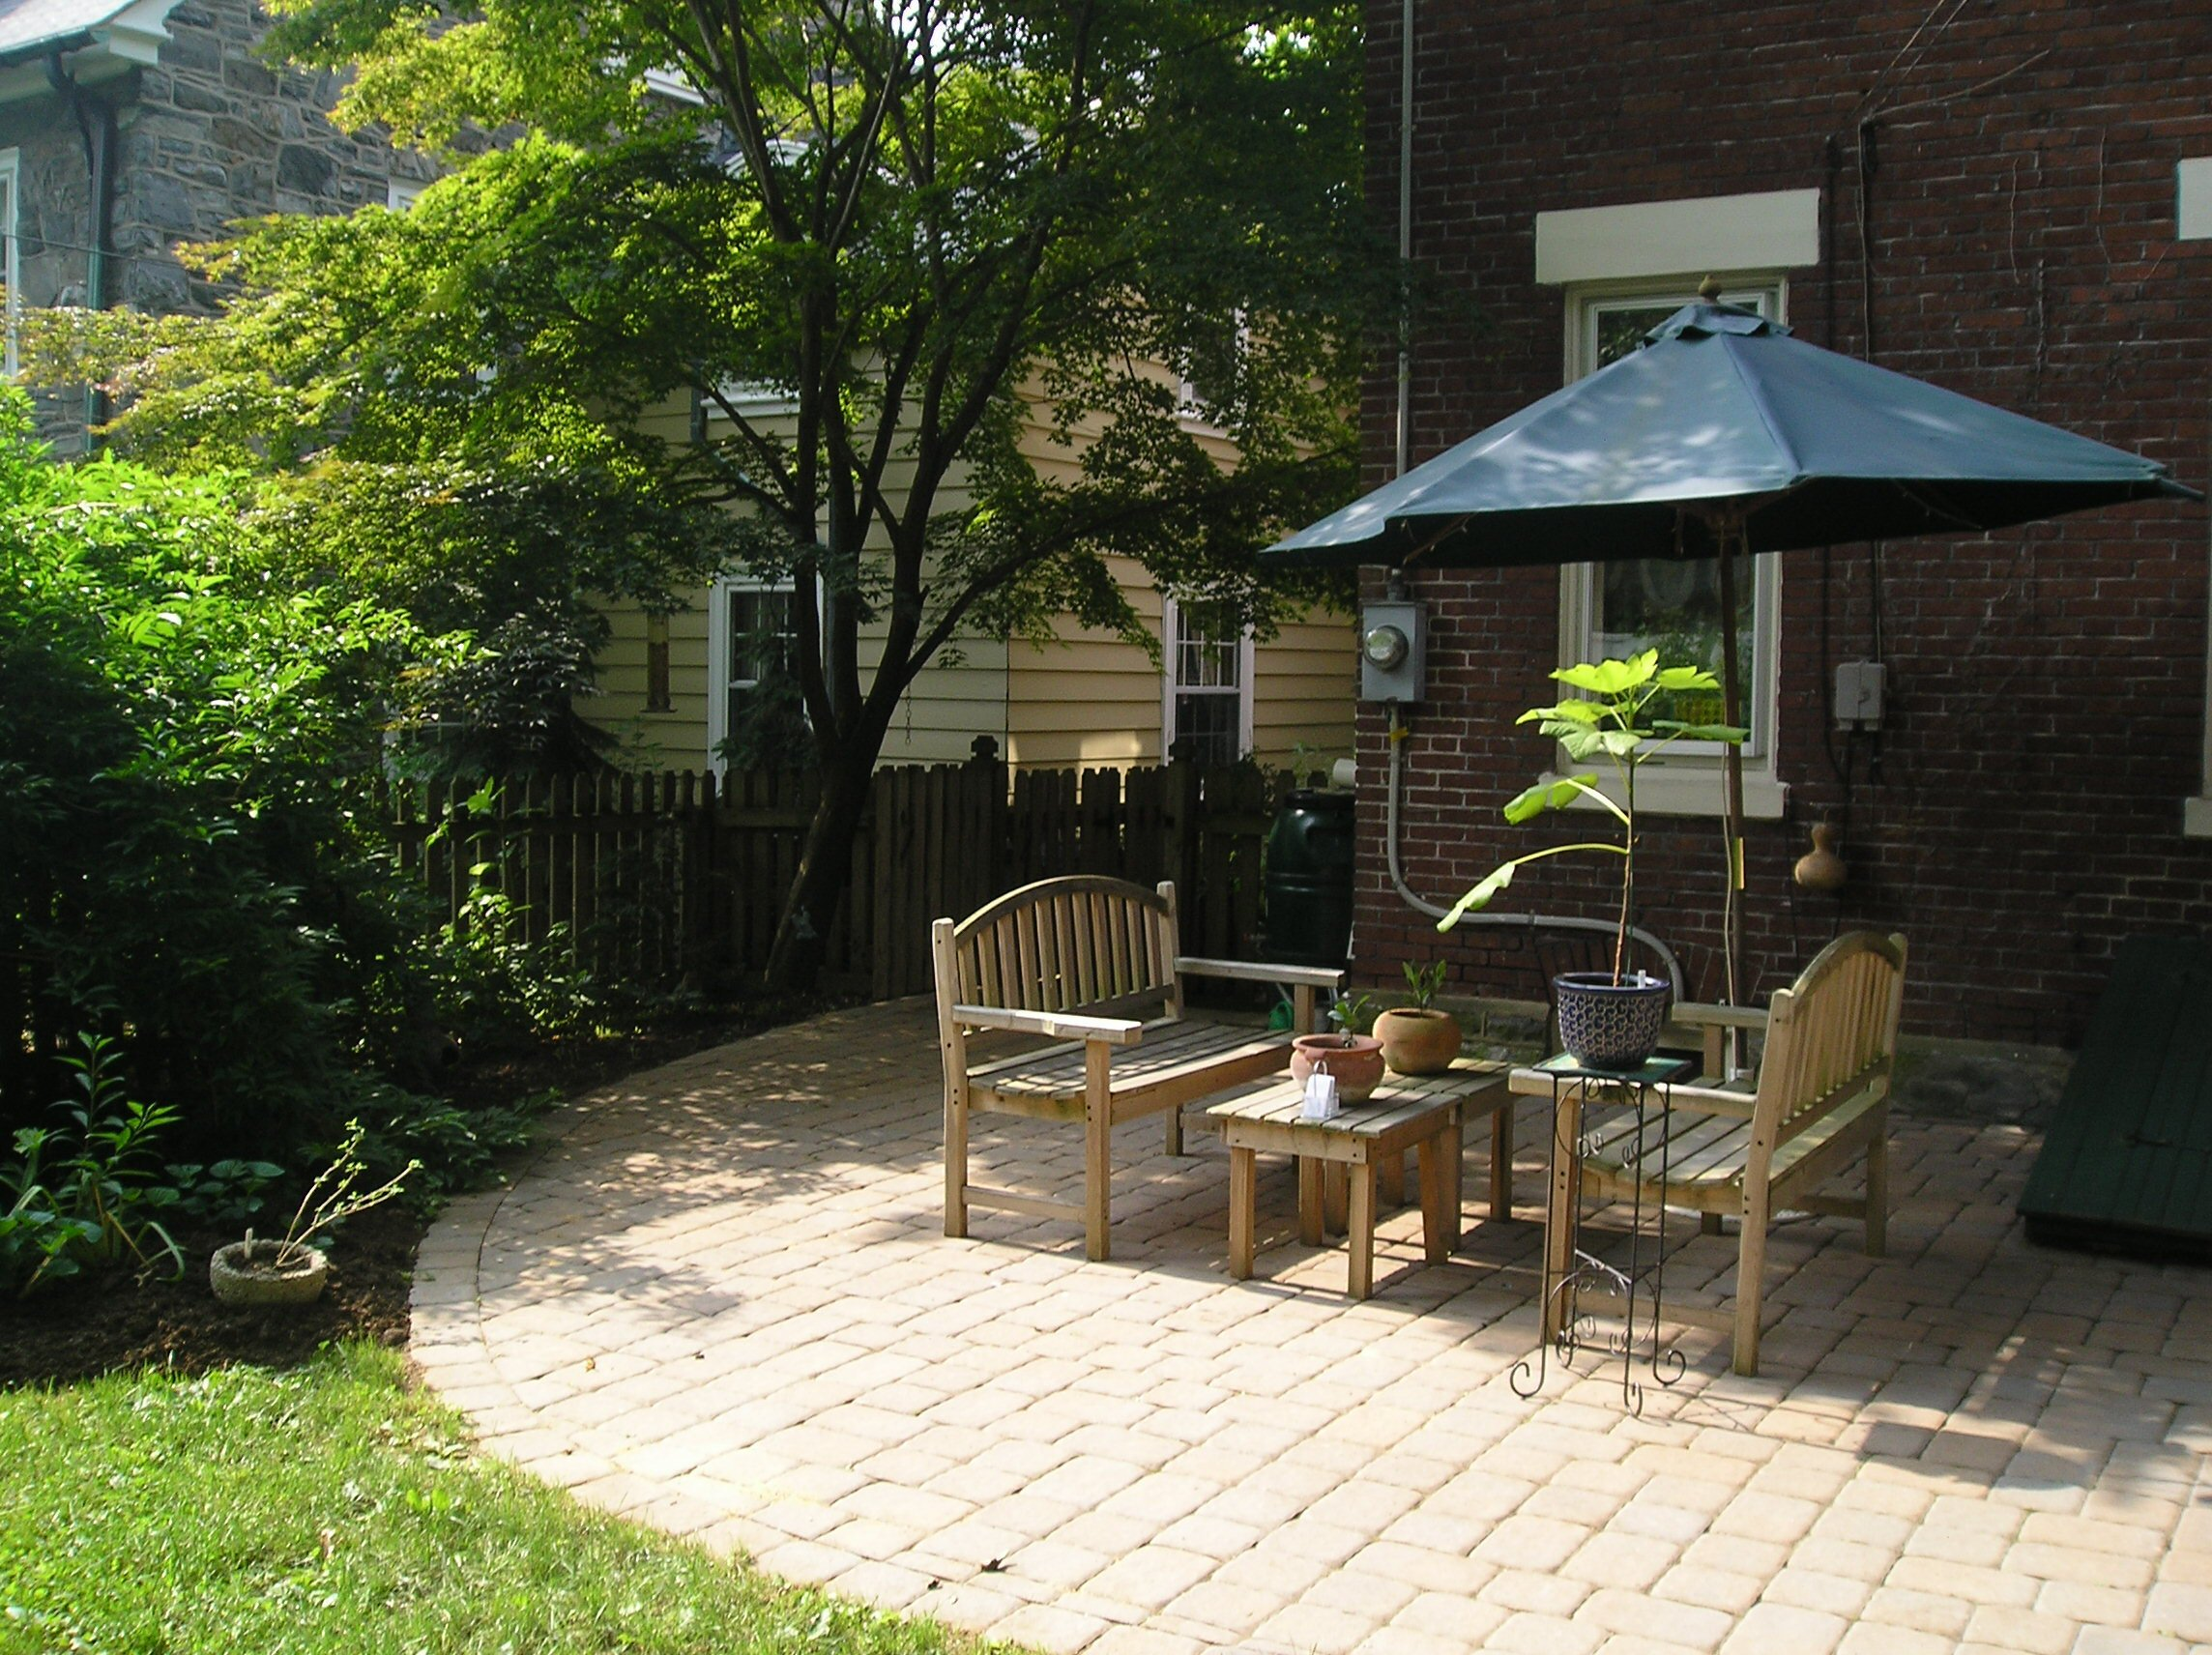 патио мебель для сада